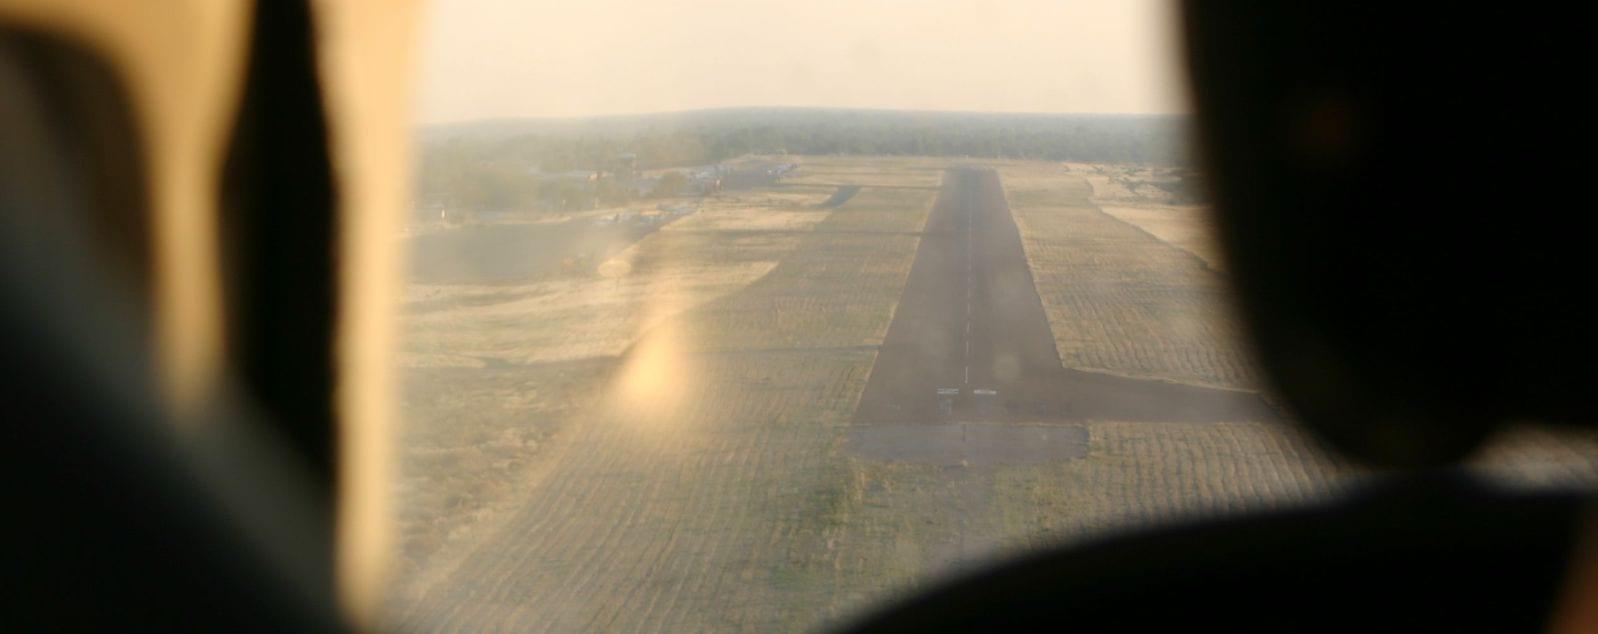 Landebahn in Botswana